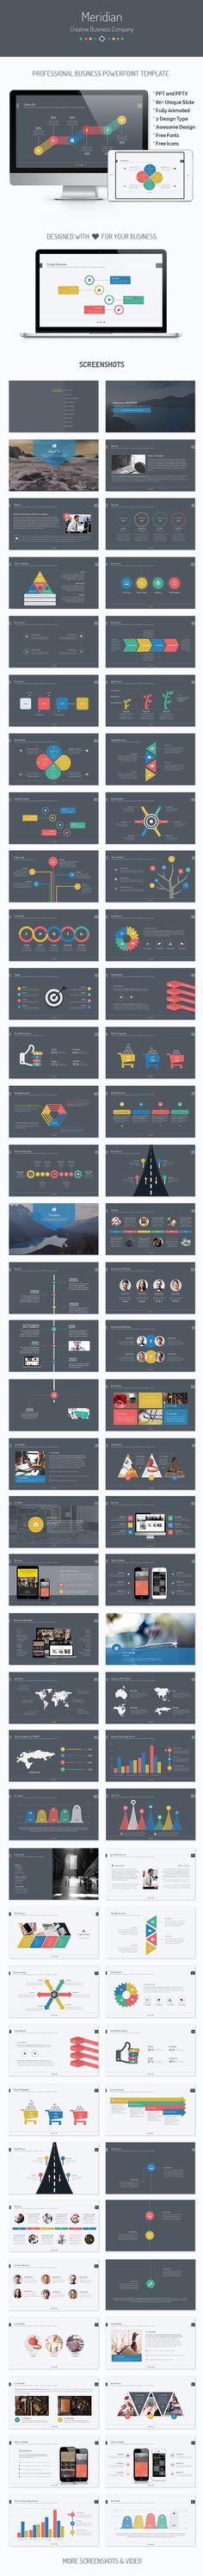 Meridian | Business Powerpoint Template #powerpoint #powerpointtemplate #presentation Download: http://graphicriver.net/item/meridian-business-powerpoint-template/10266593?ref=ksioks